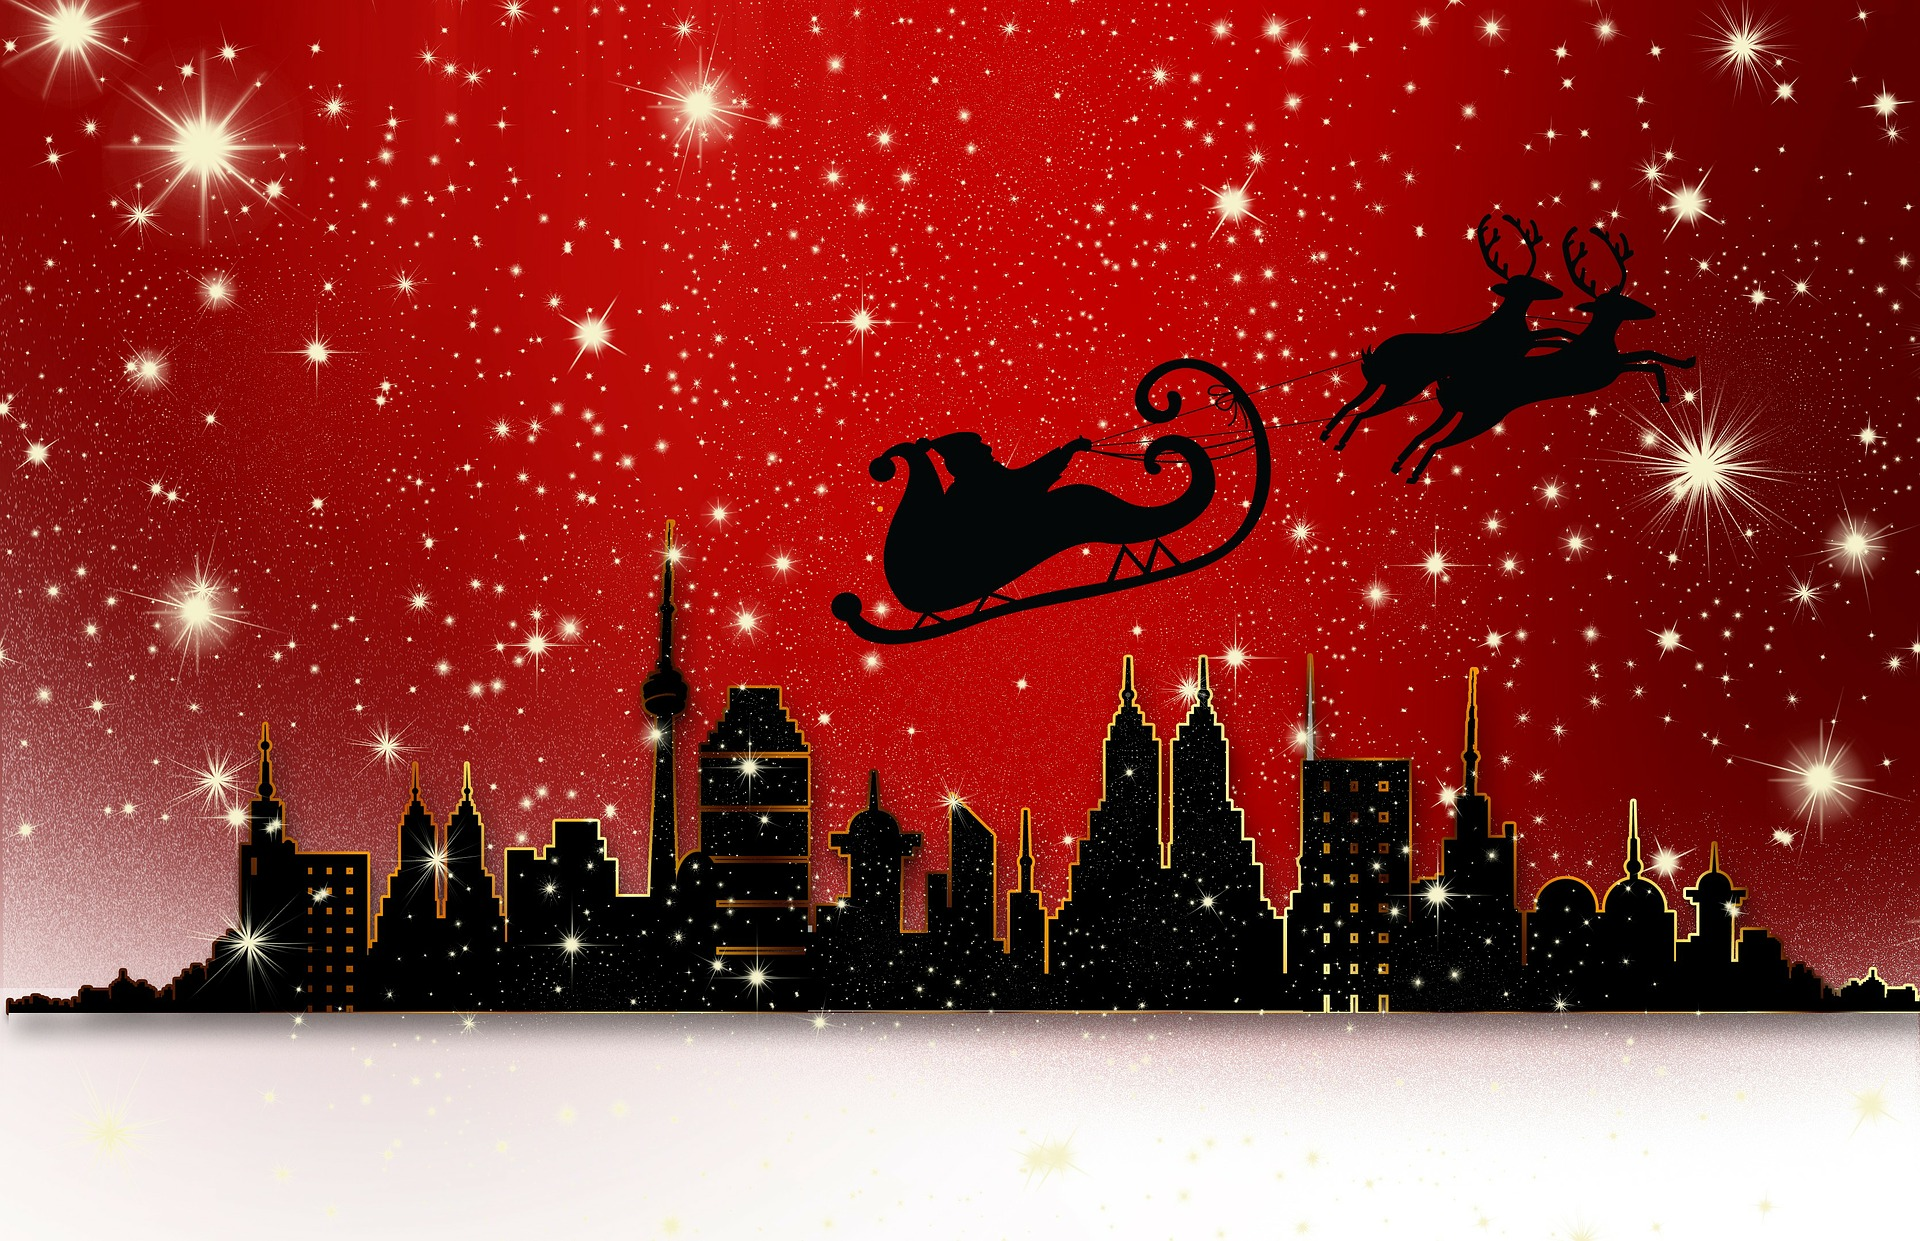 Sfondo Natalizio - Sfondi natalizi gratis